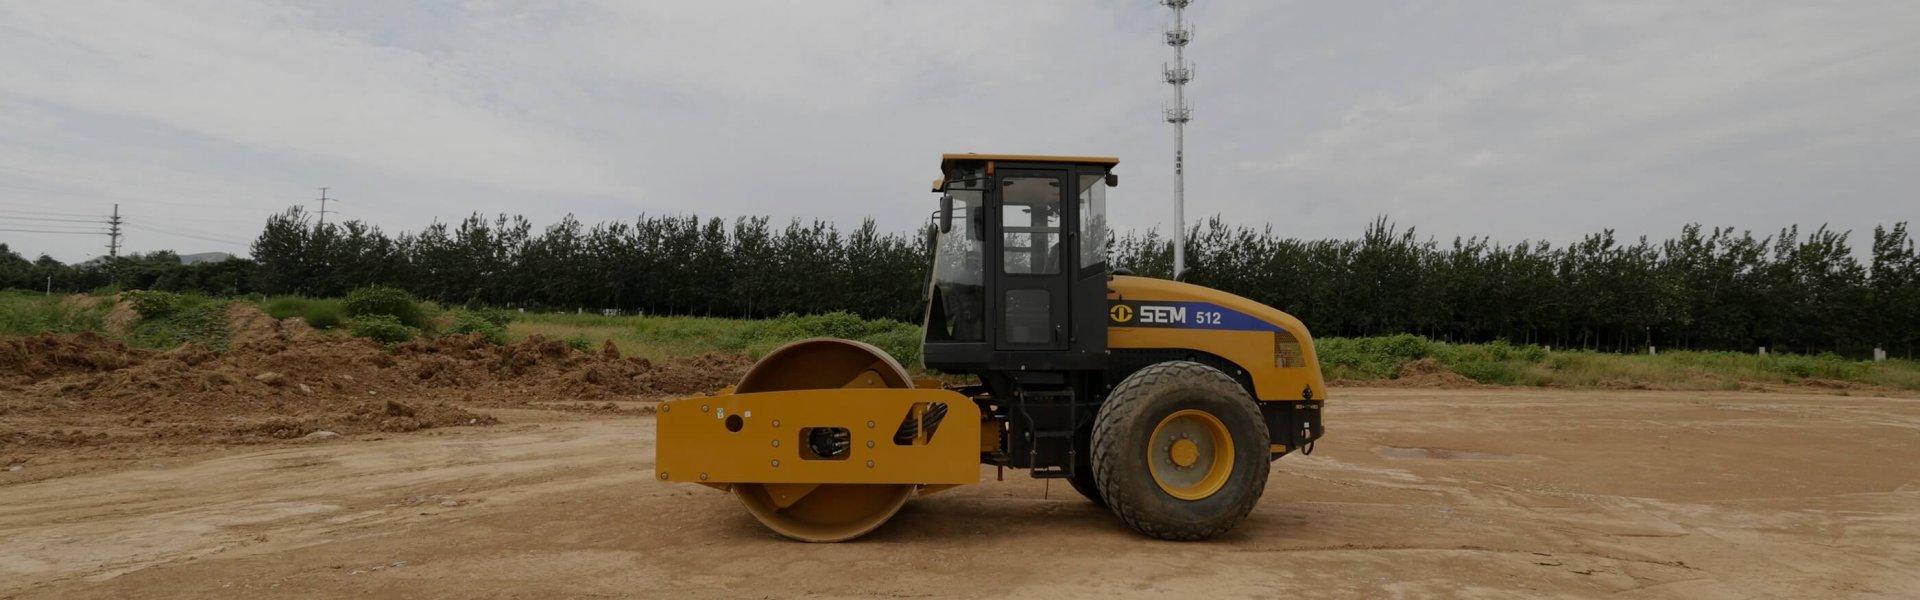 SEM Soil Compactor 512